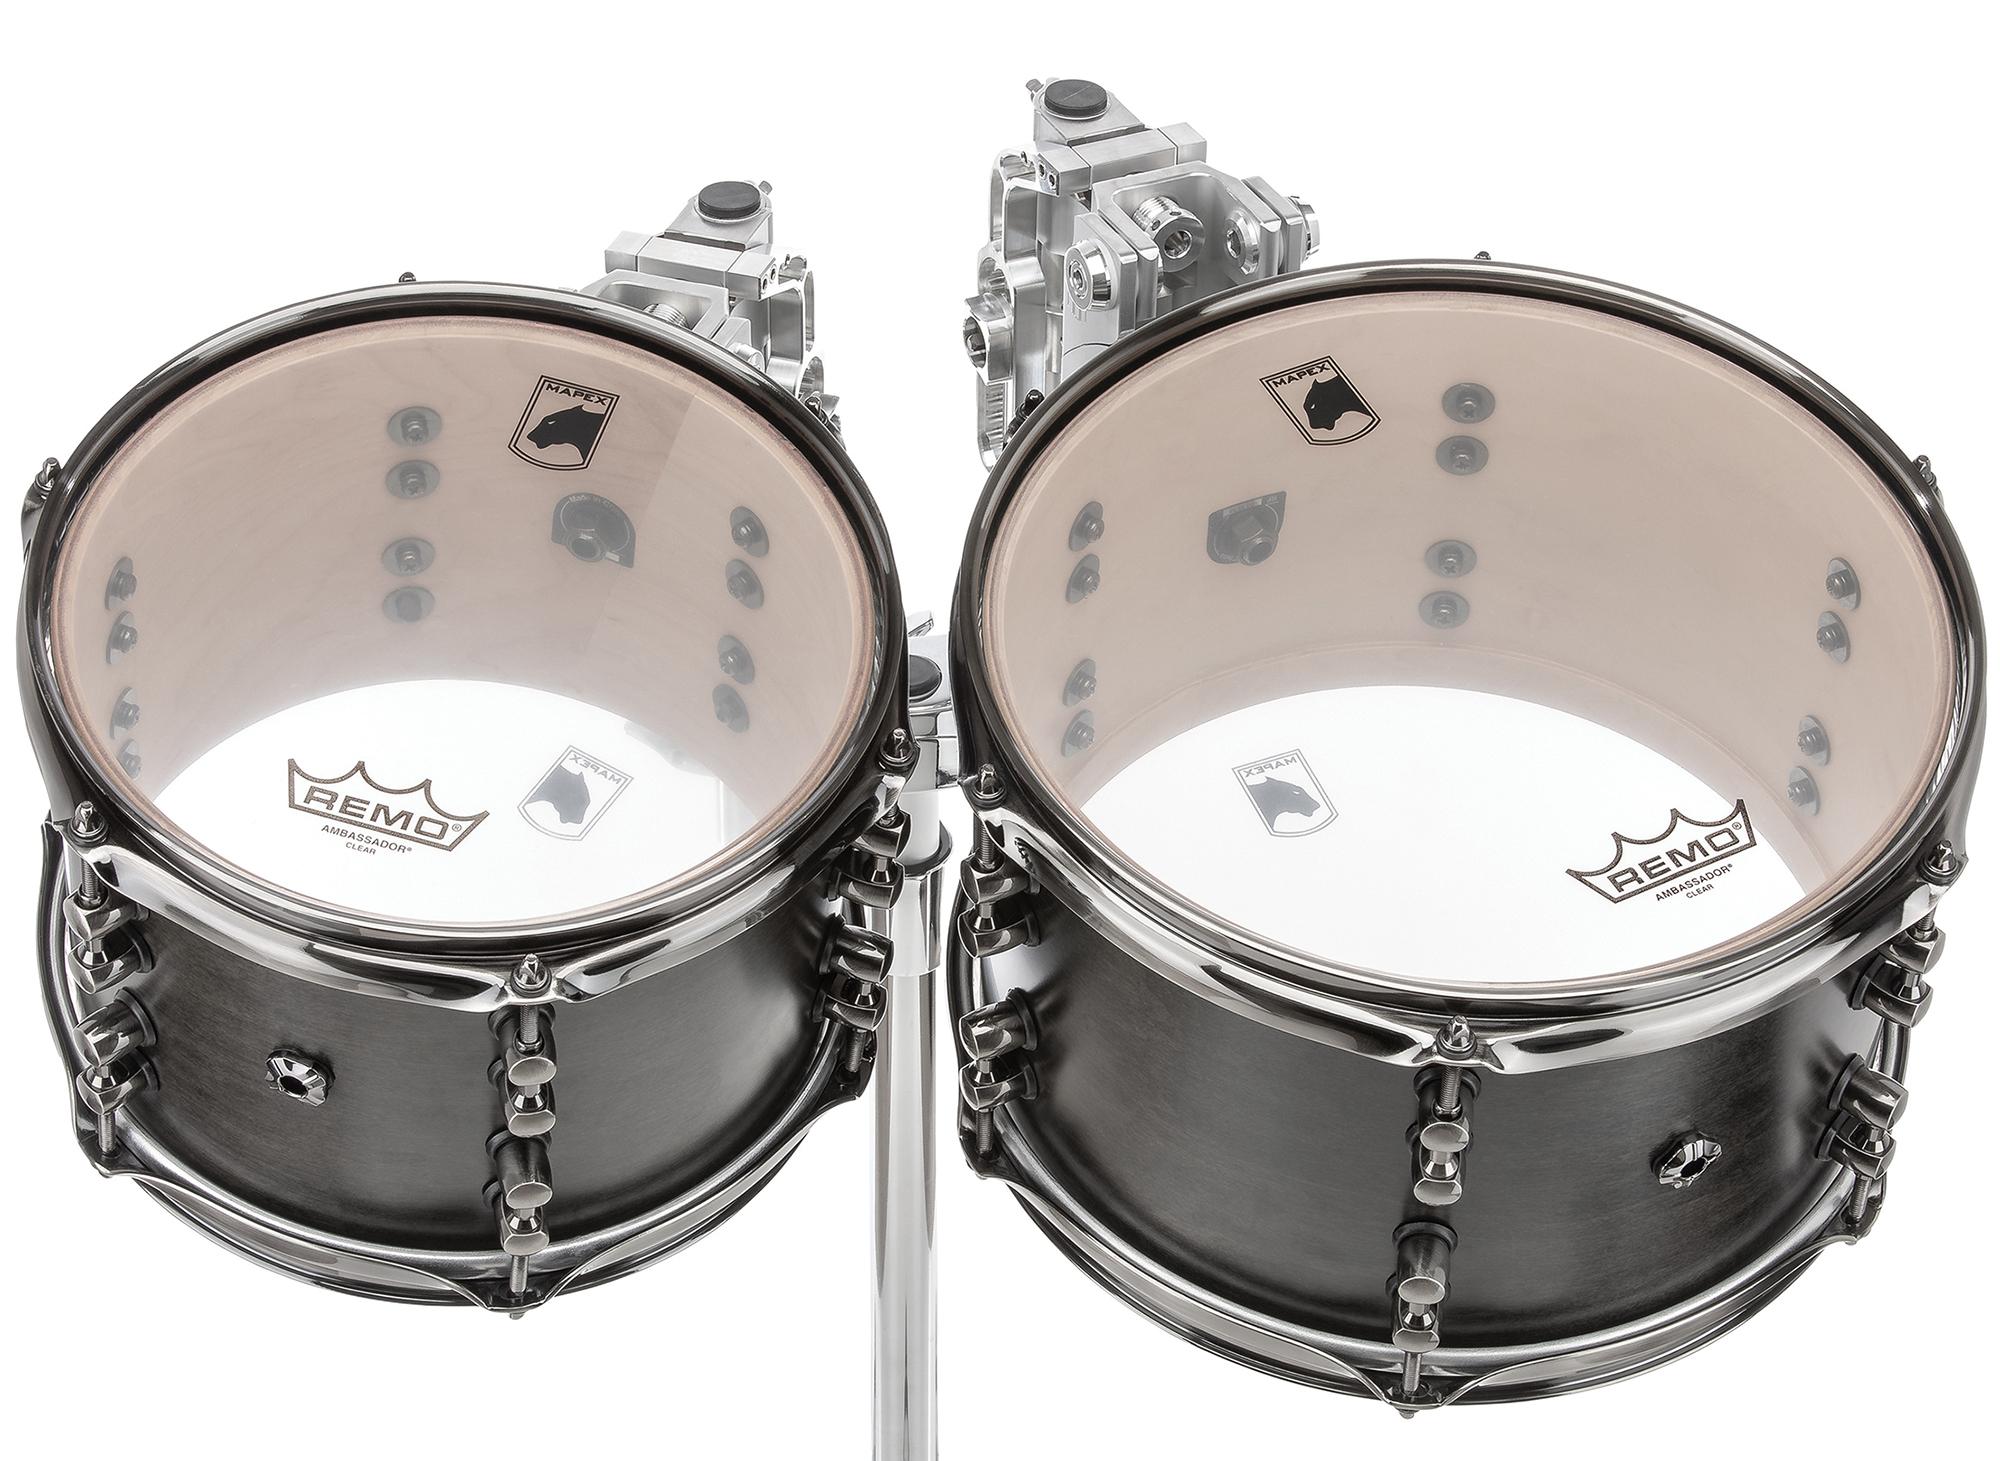 MAATS-with-drums-01.jpg